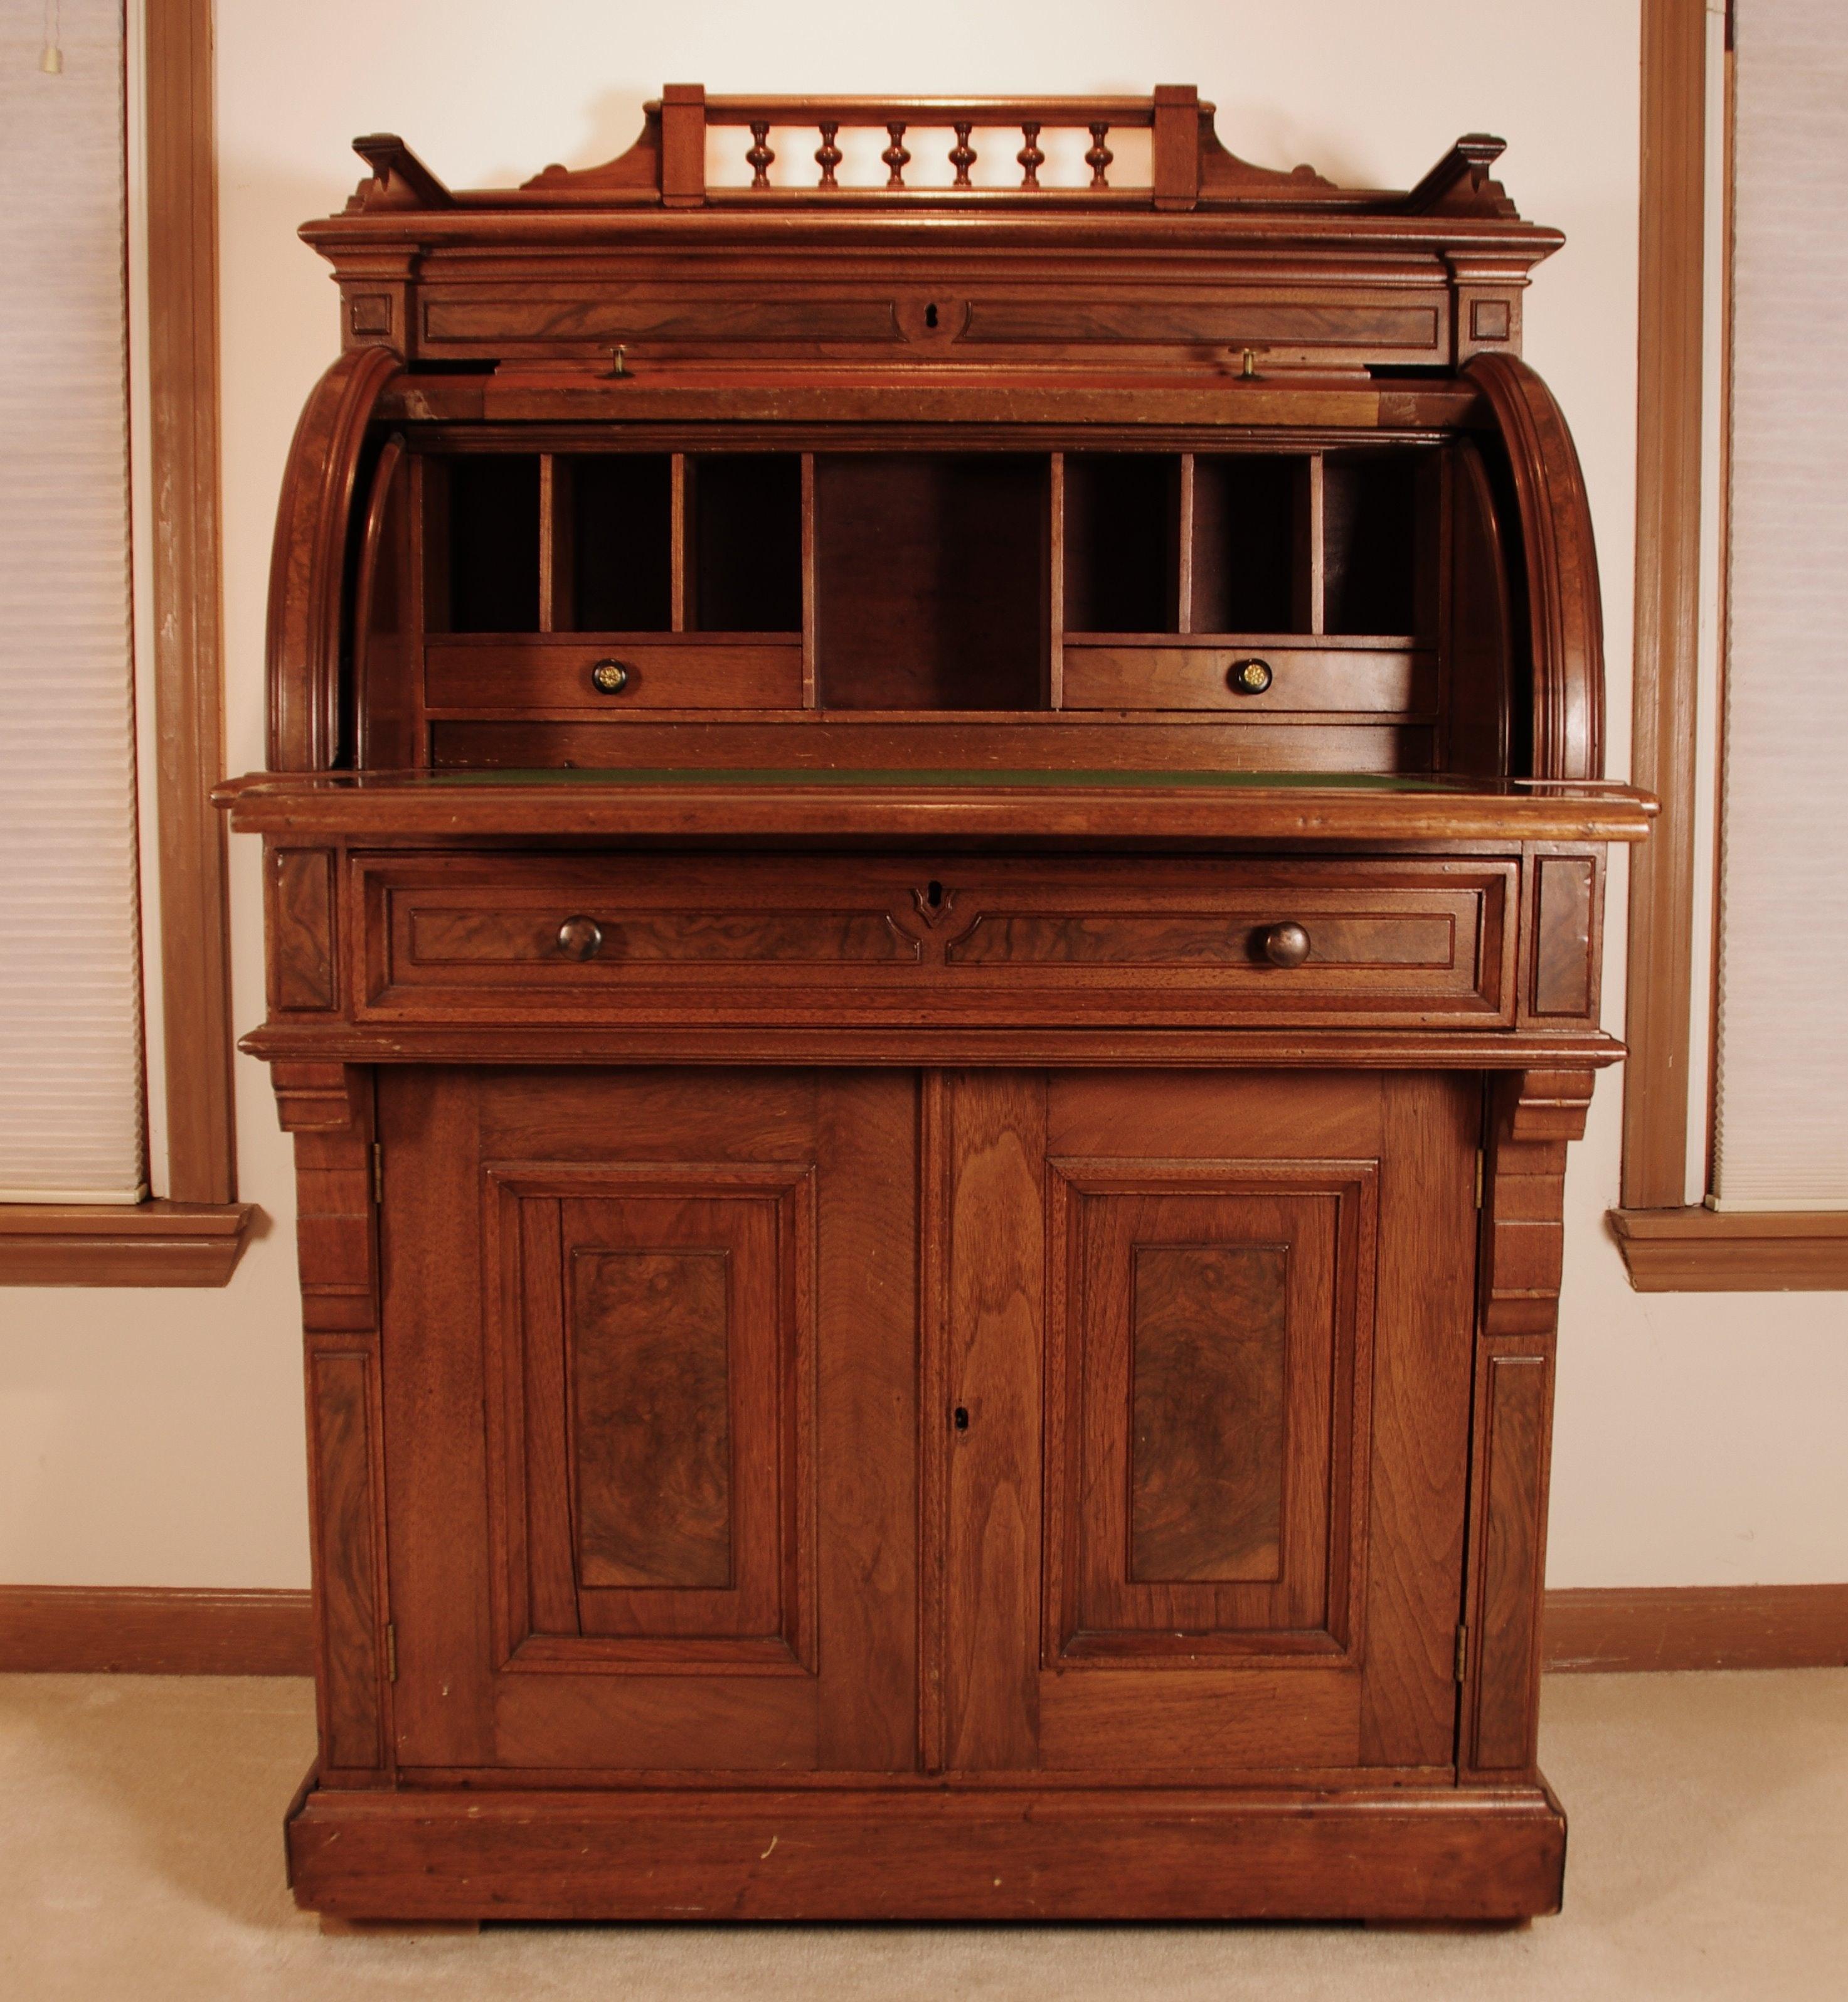 Victorian Renaissance Revival Cylinder Desk Circa 1865-75